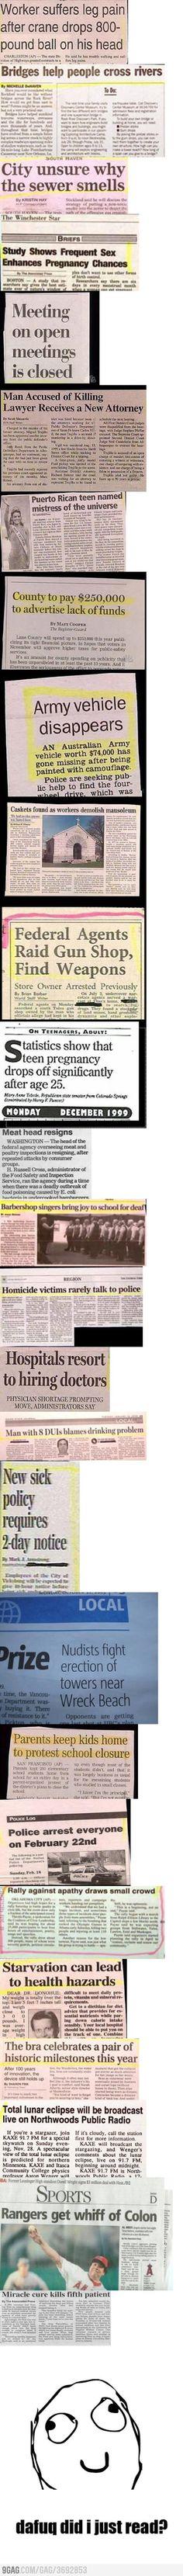 The Best of Headlines